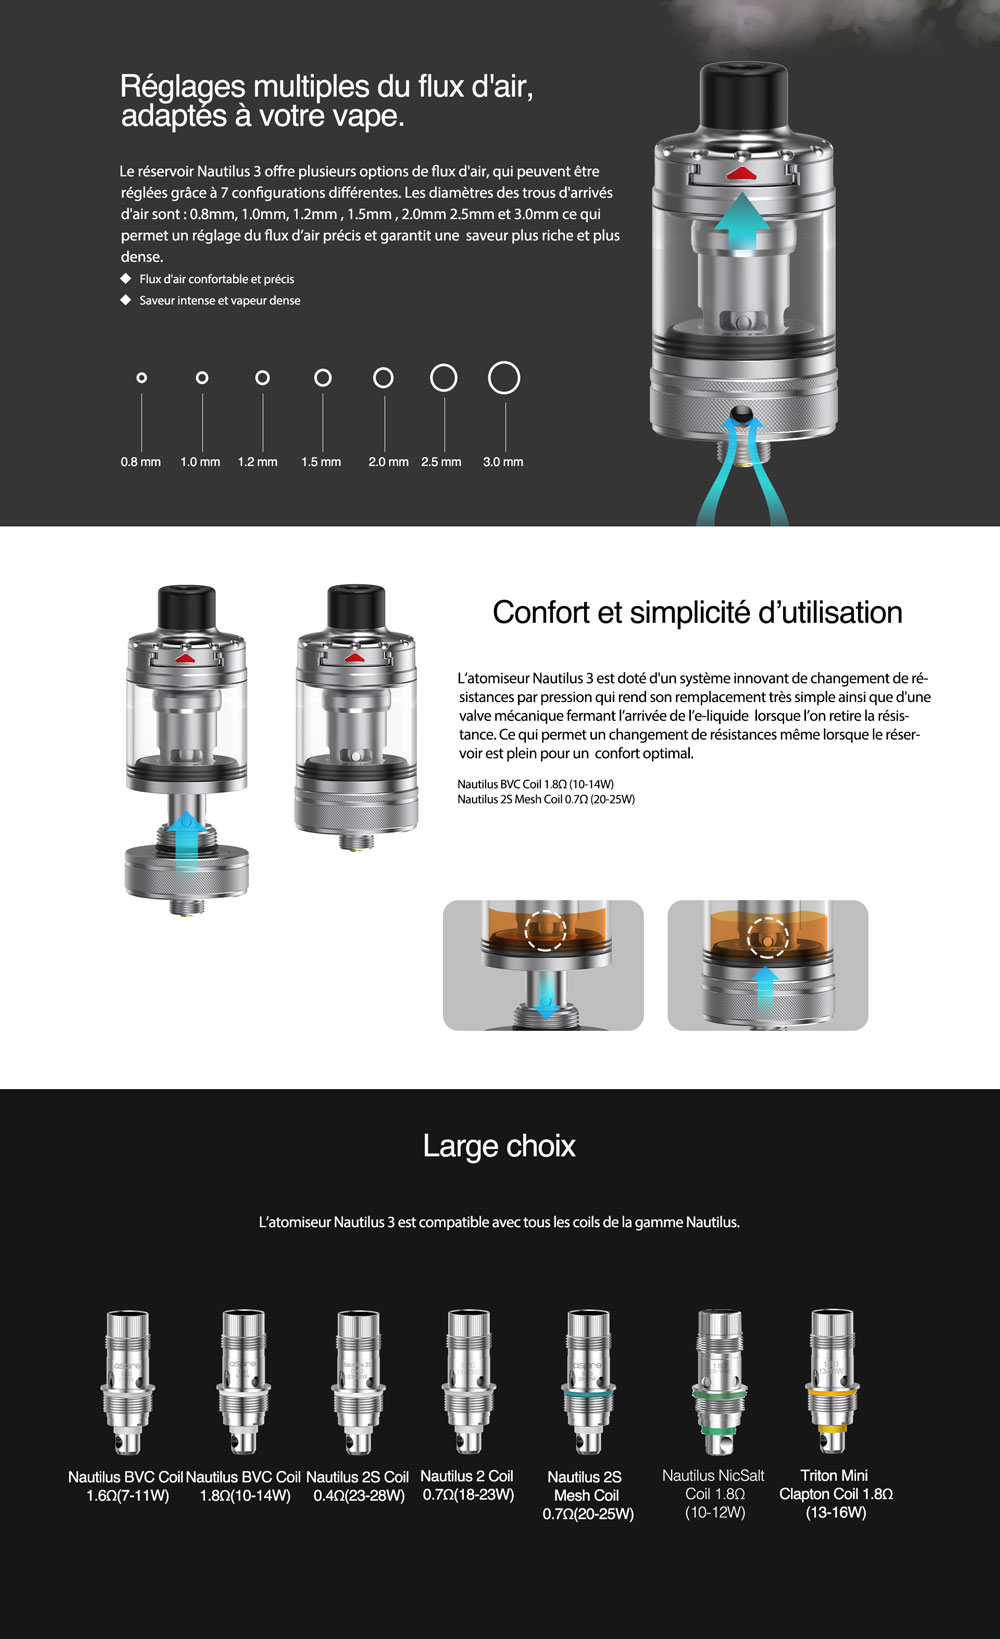 Zelos-3-Kit-website-page-3.jpg